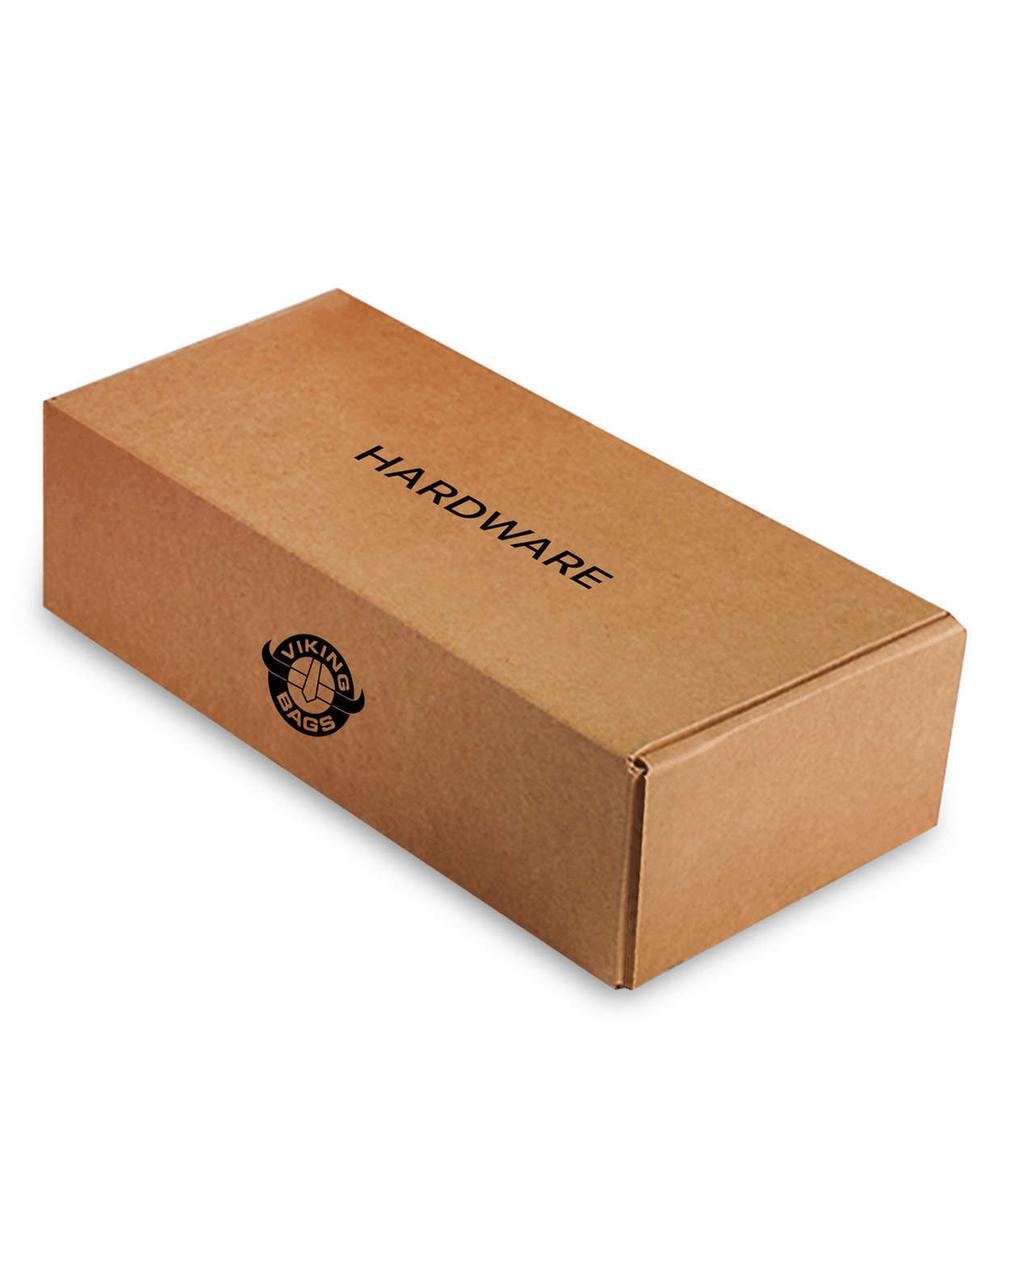 Honda VTX 1800 F Warrior Slanted Medium Motorcycle Saddlebags Hardware Box